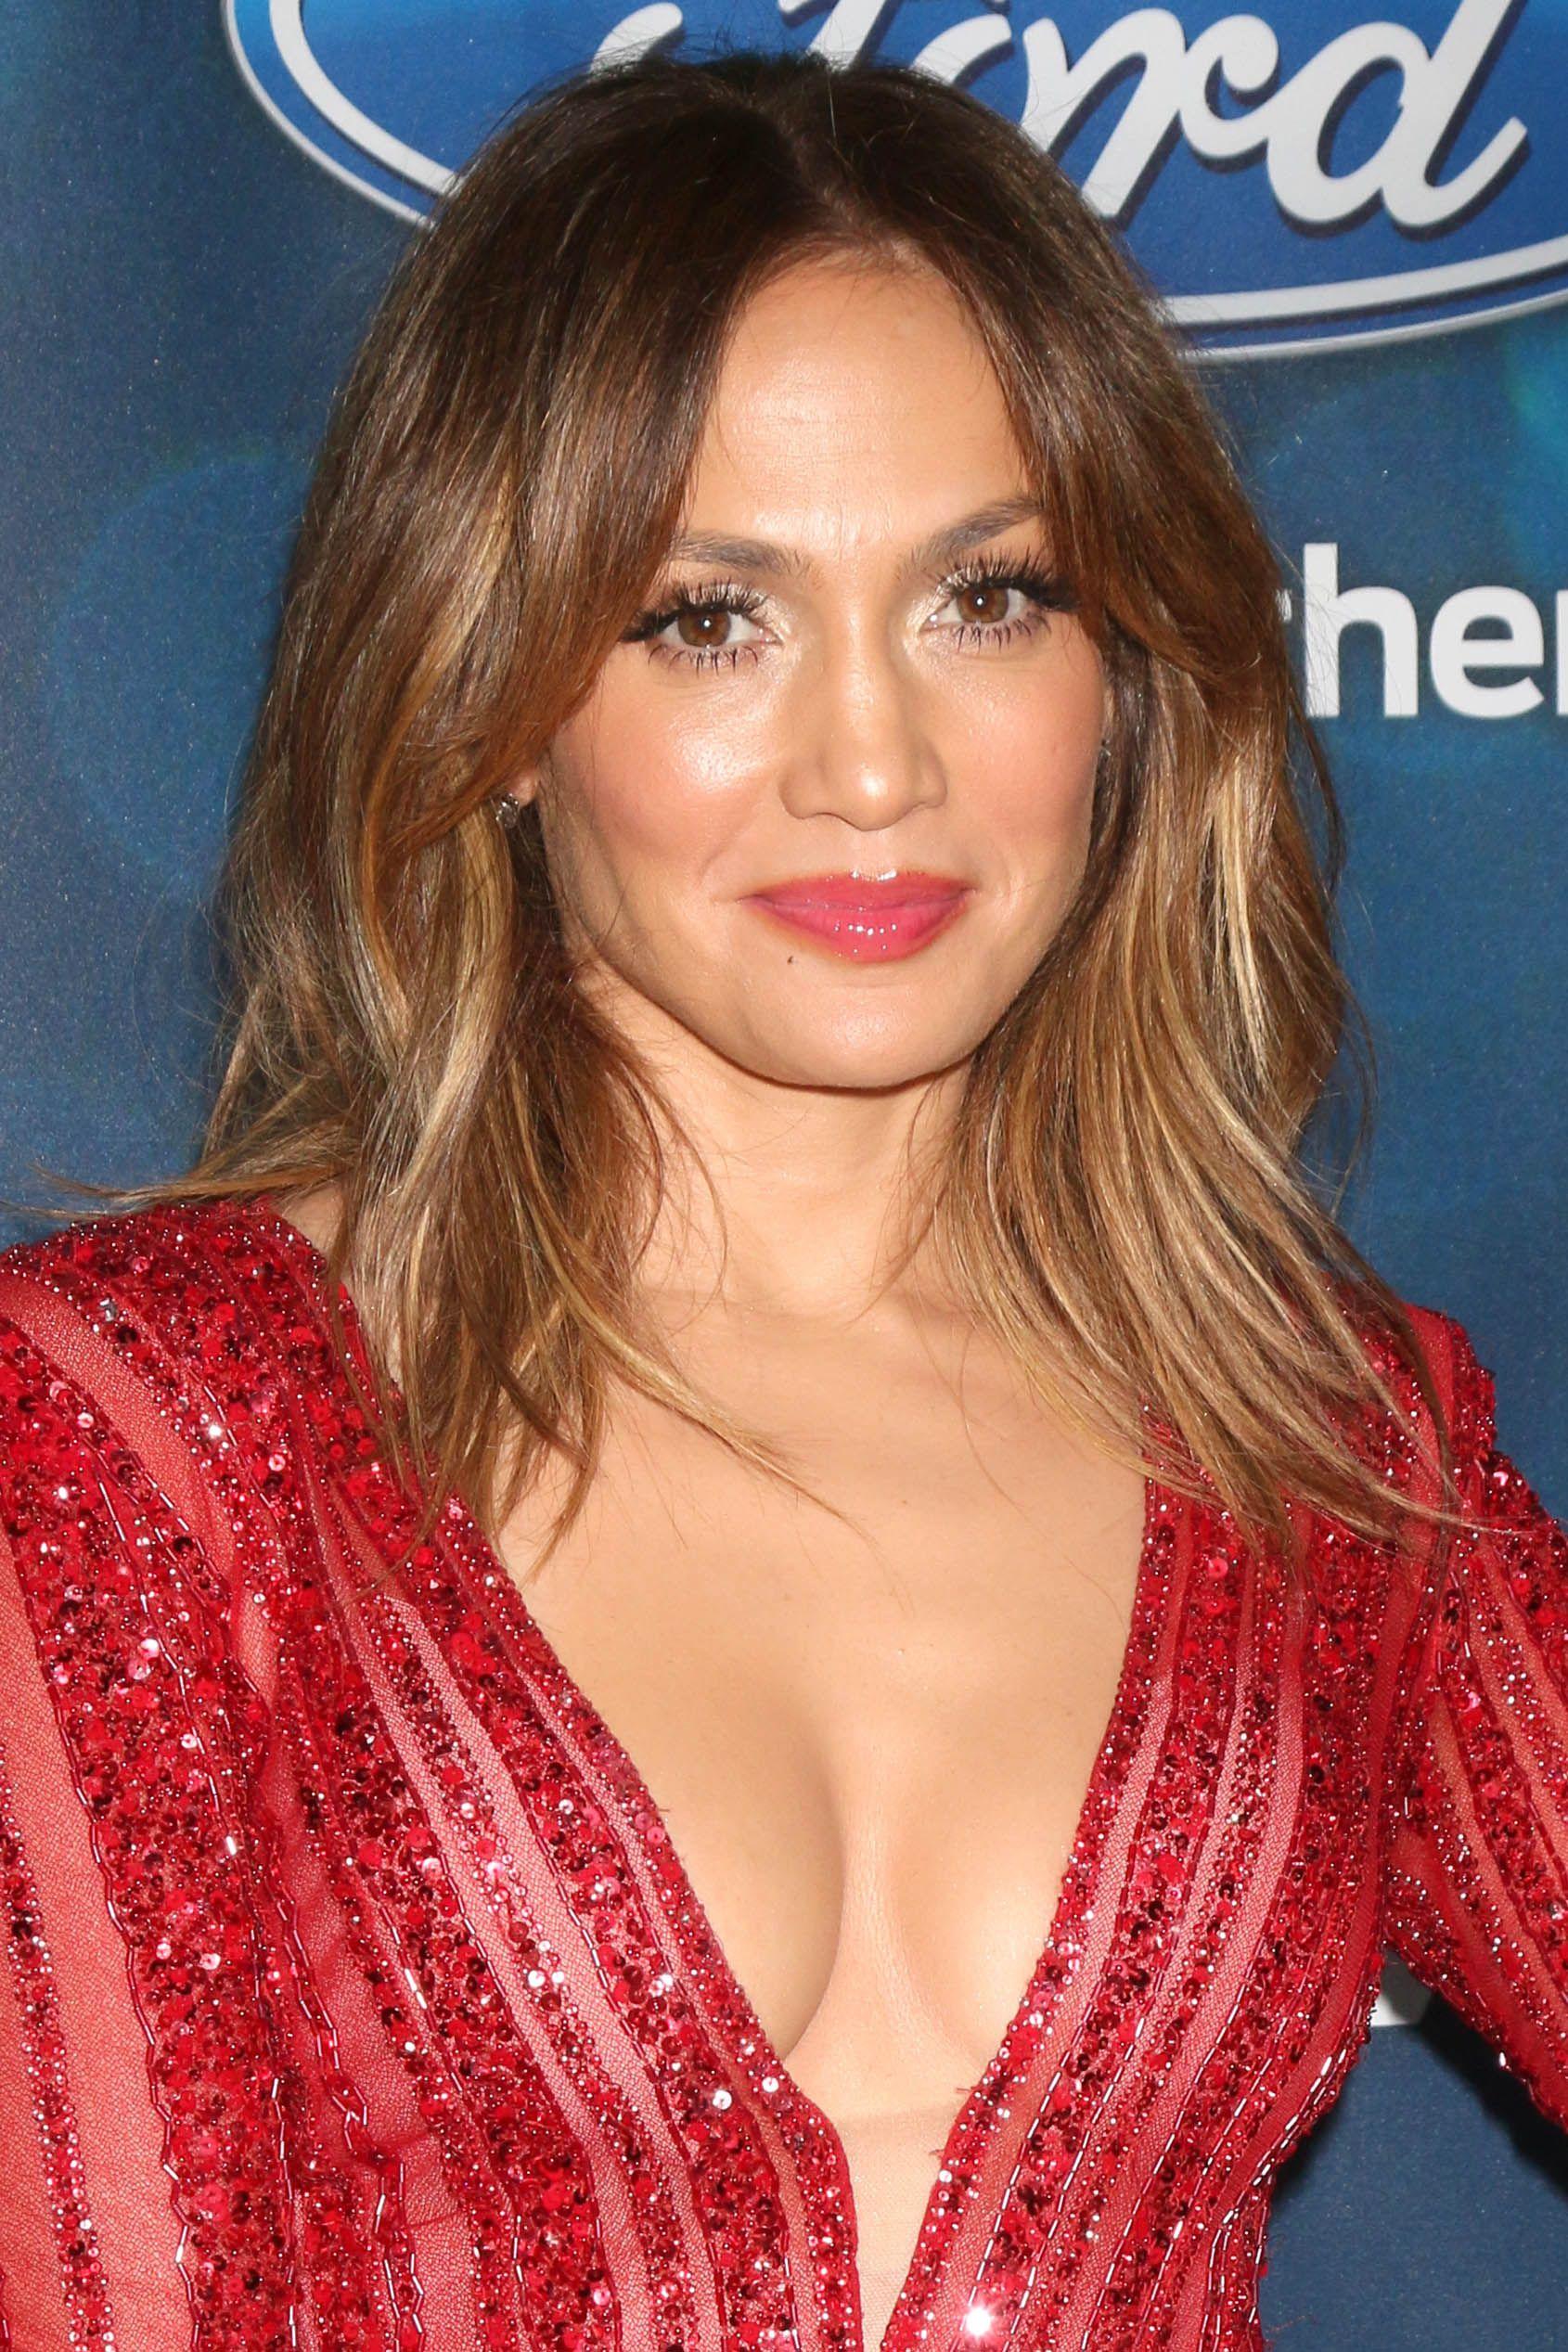 Sexy pics of Jennifer Lopez | The Fappening - News